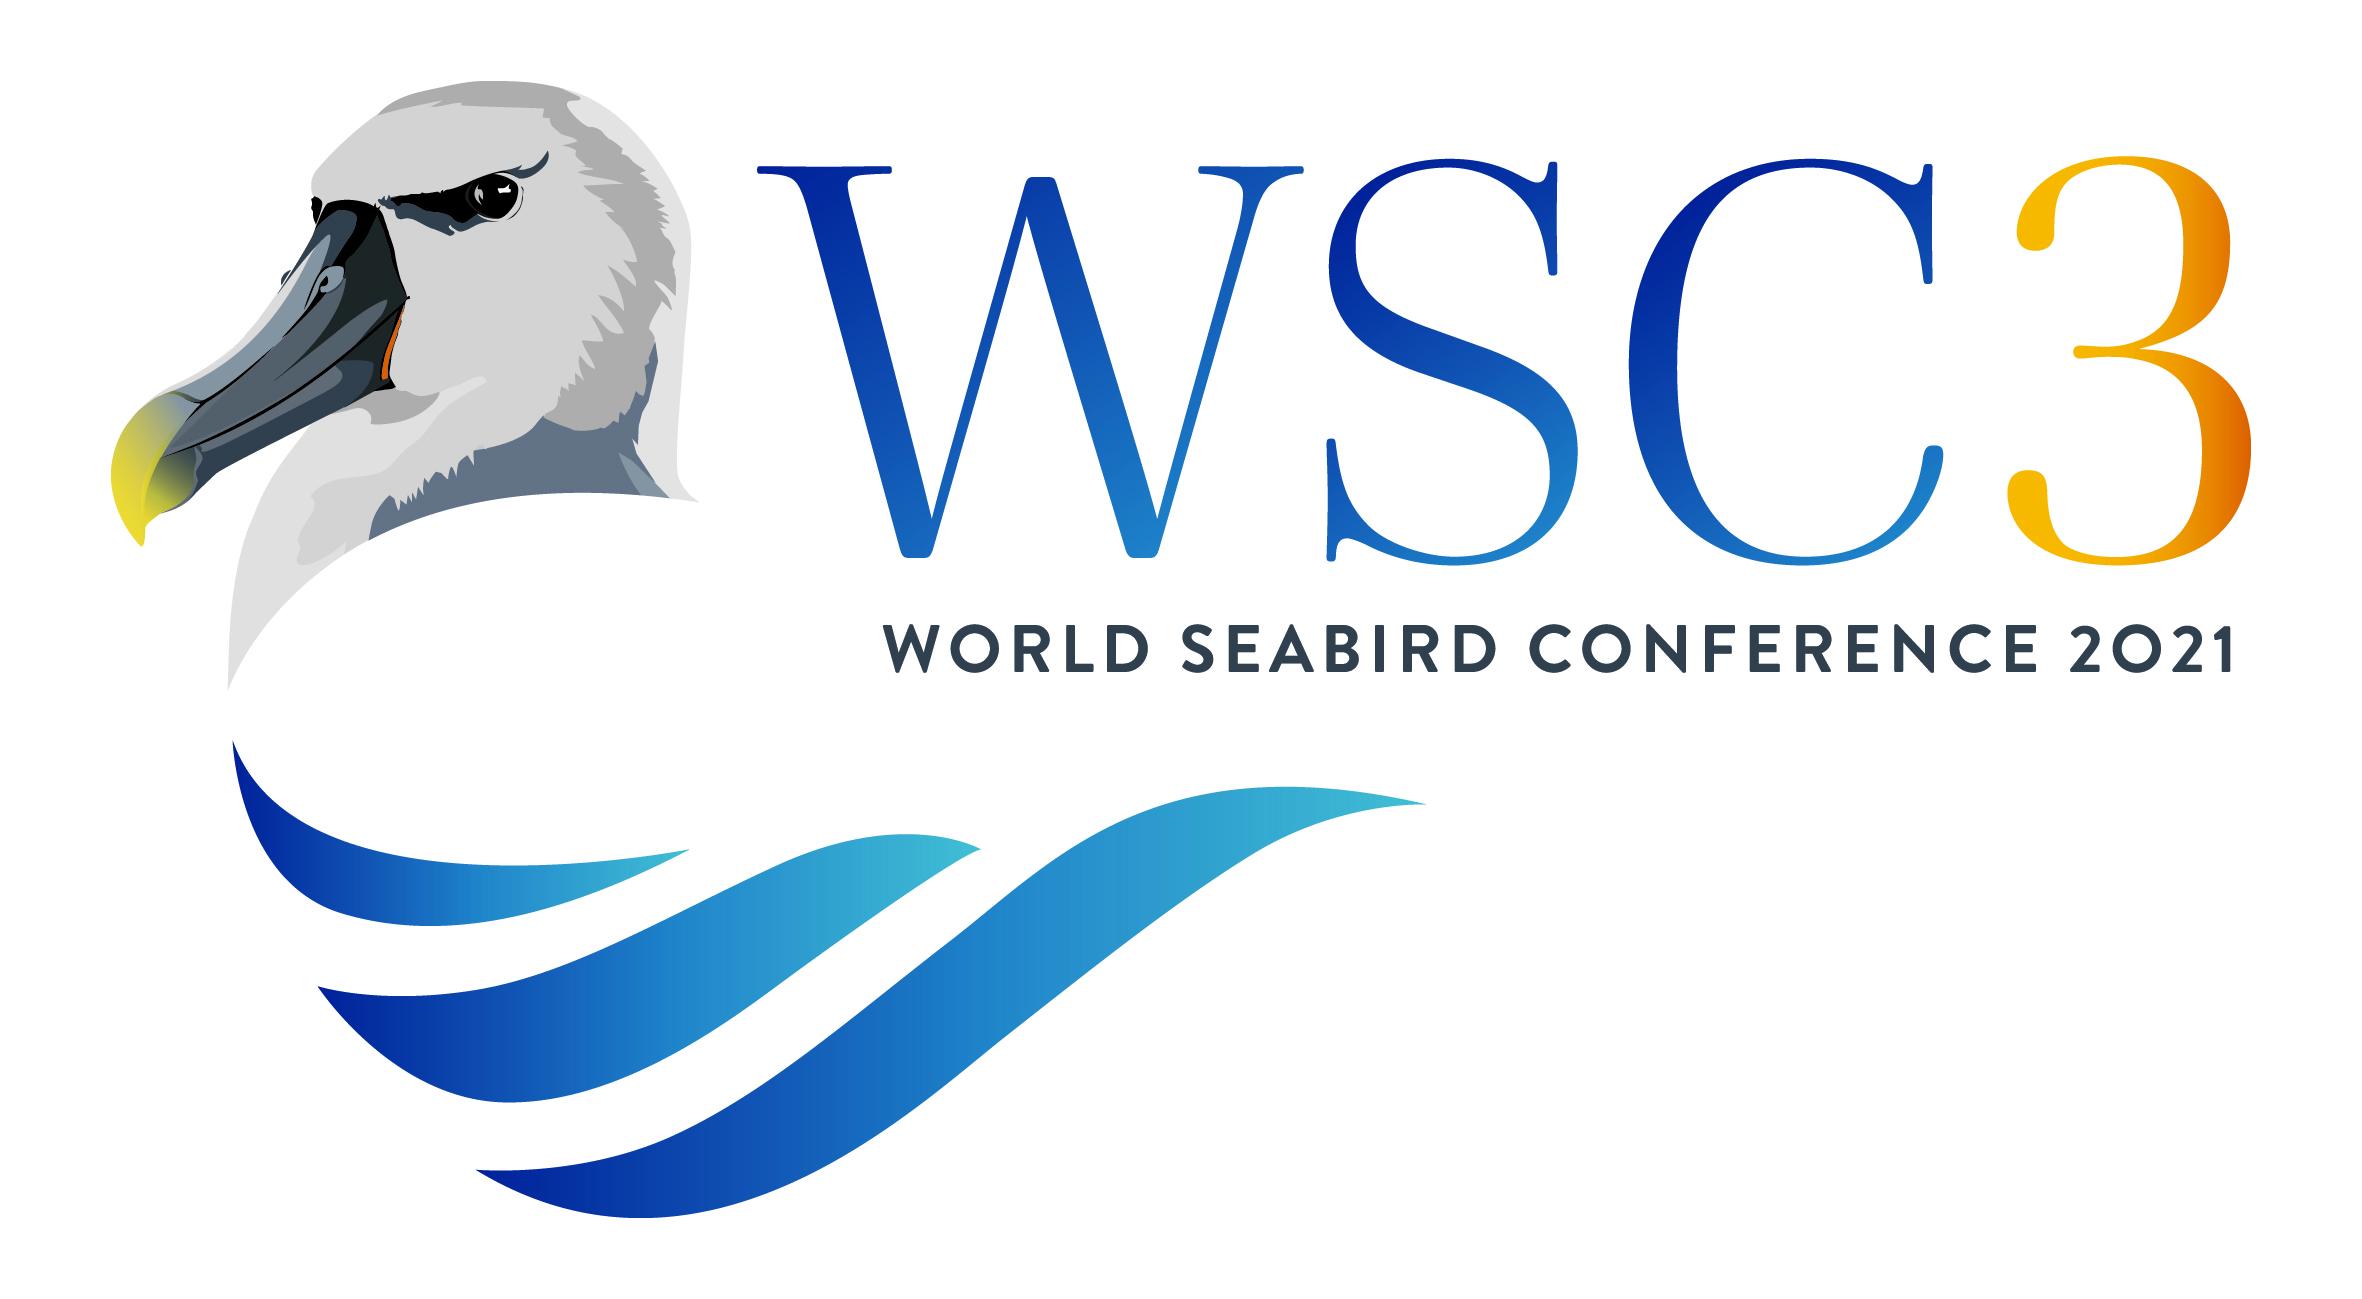 World Seabird Conference